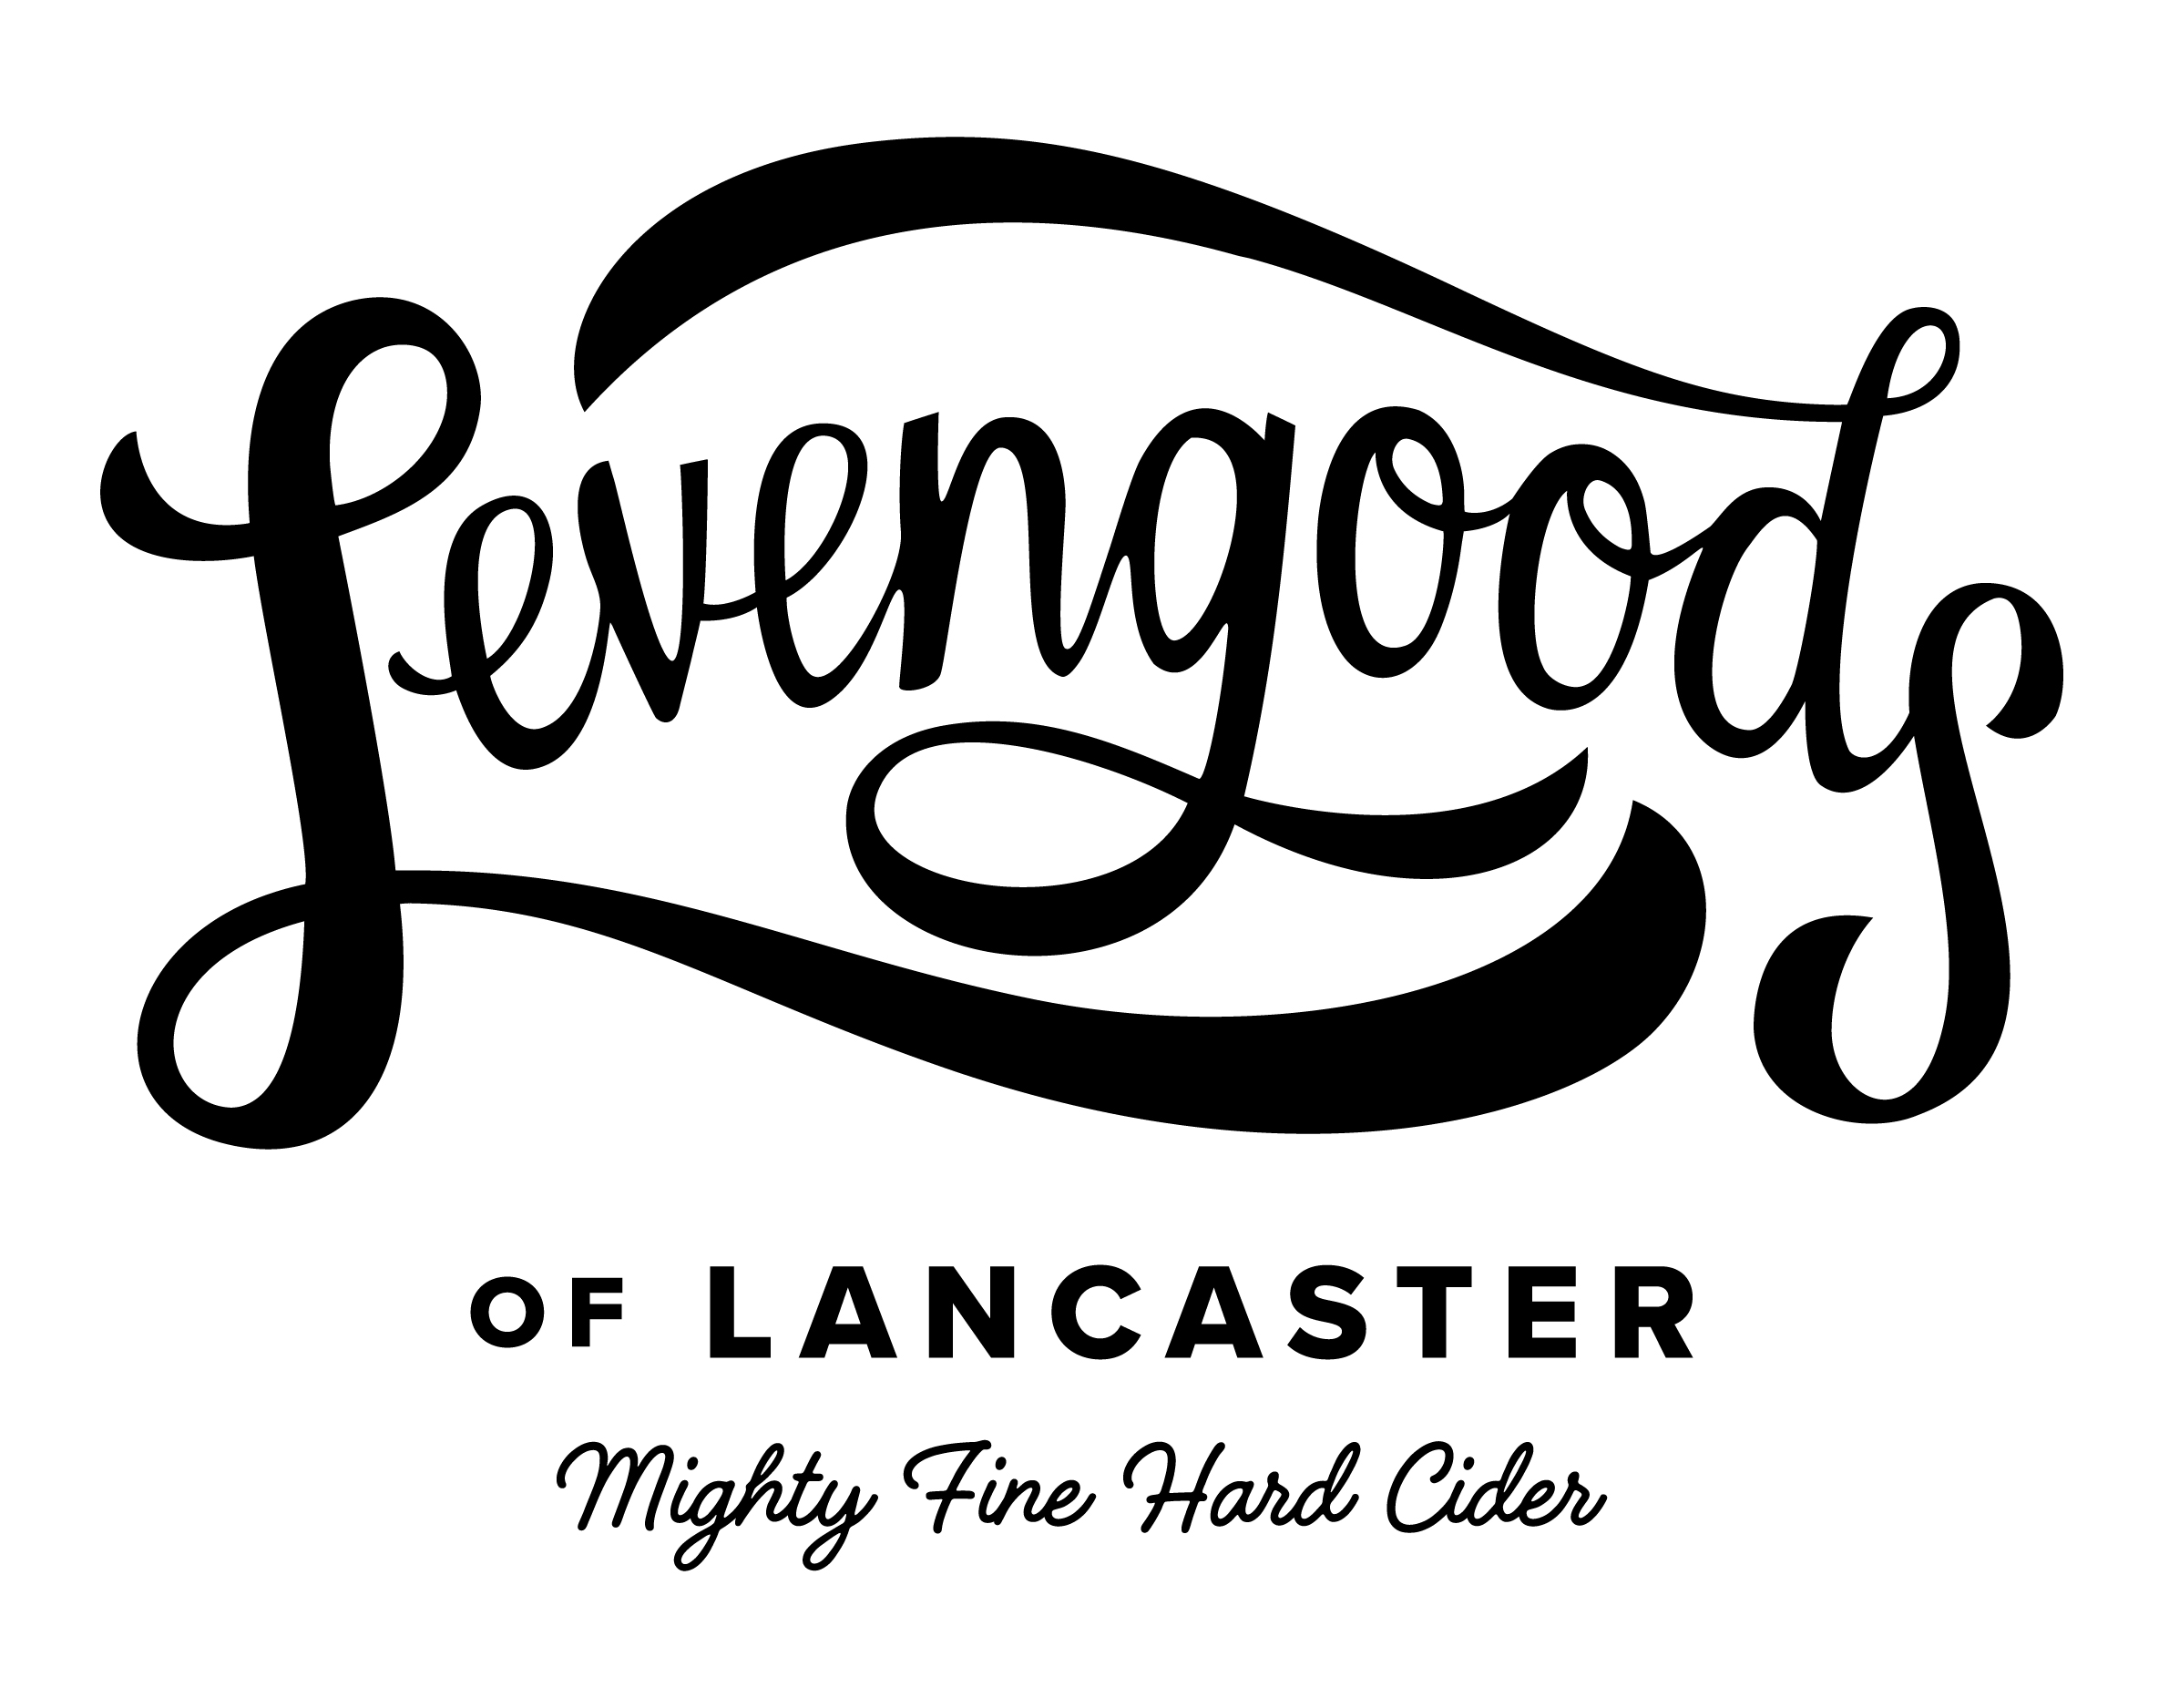 Levengoods of Lancaster